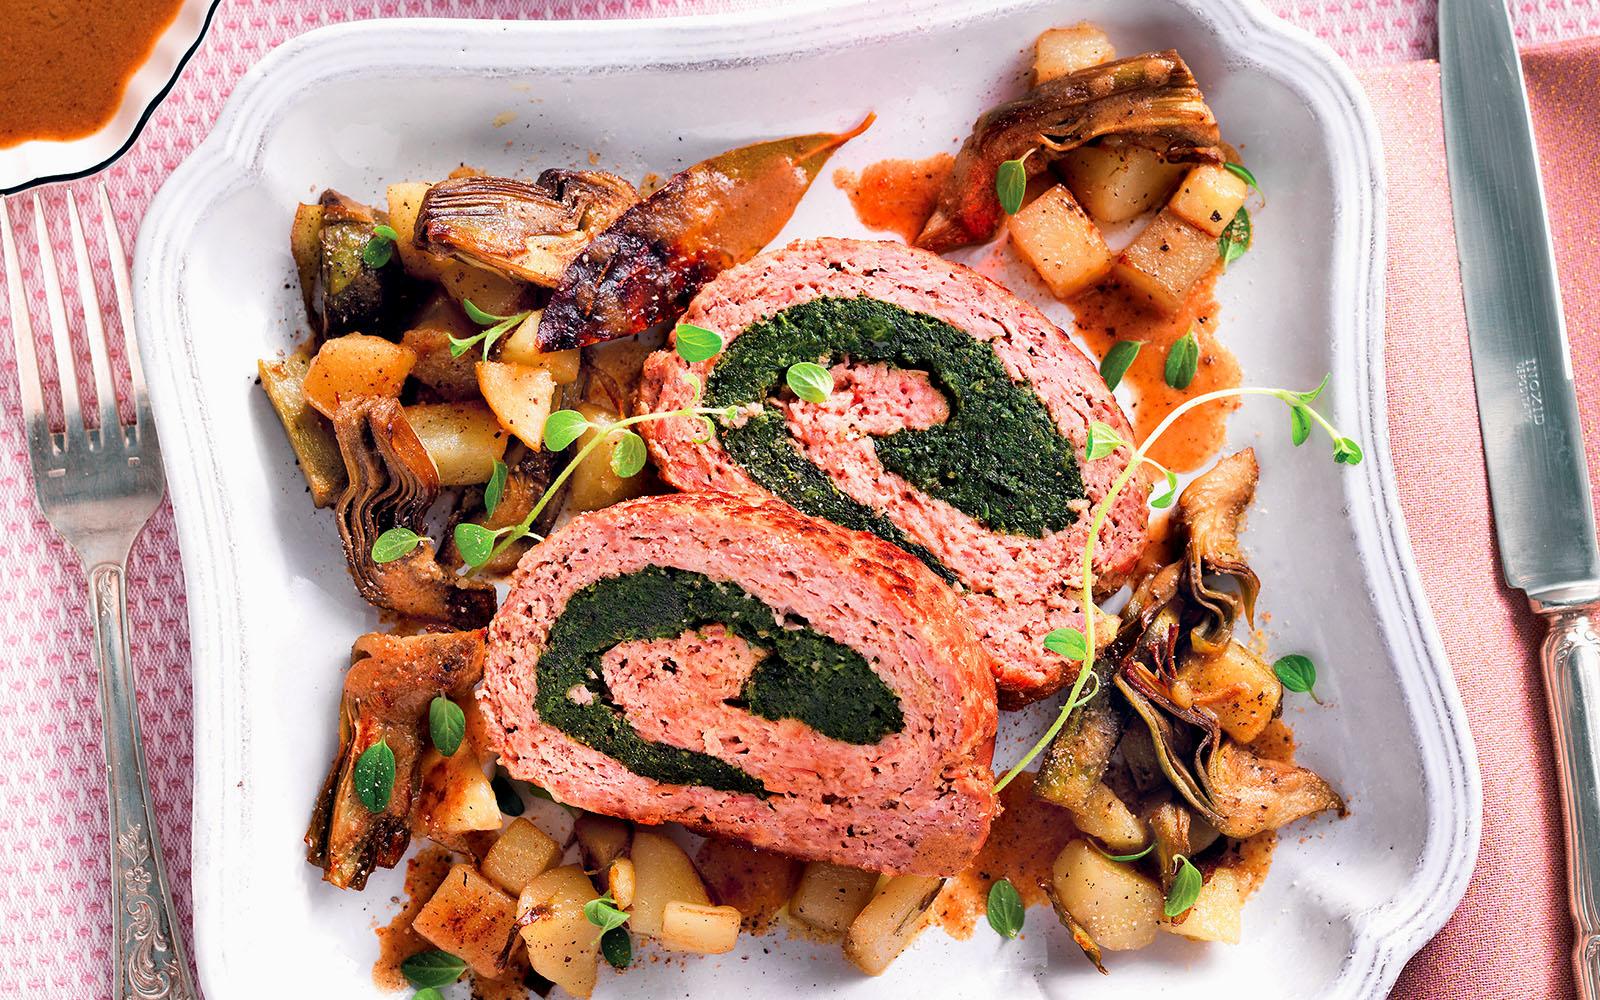 Recipe Stuffed meatloaf, potatoes and artichokes